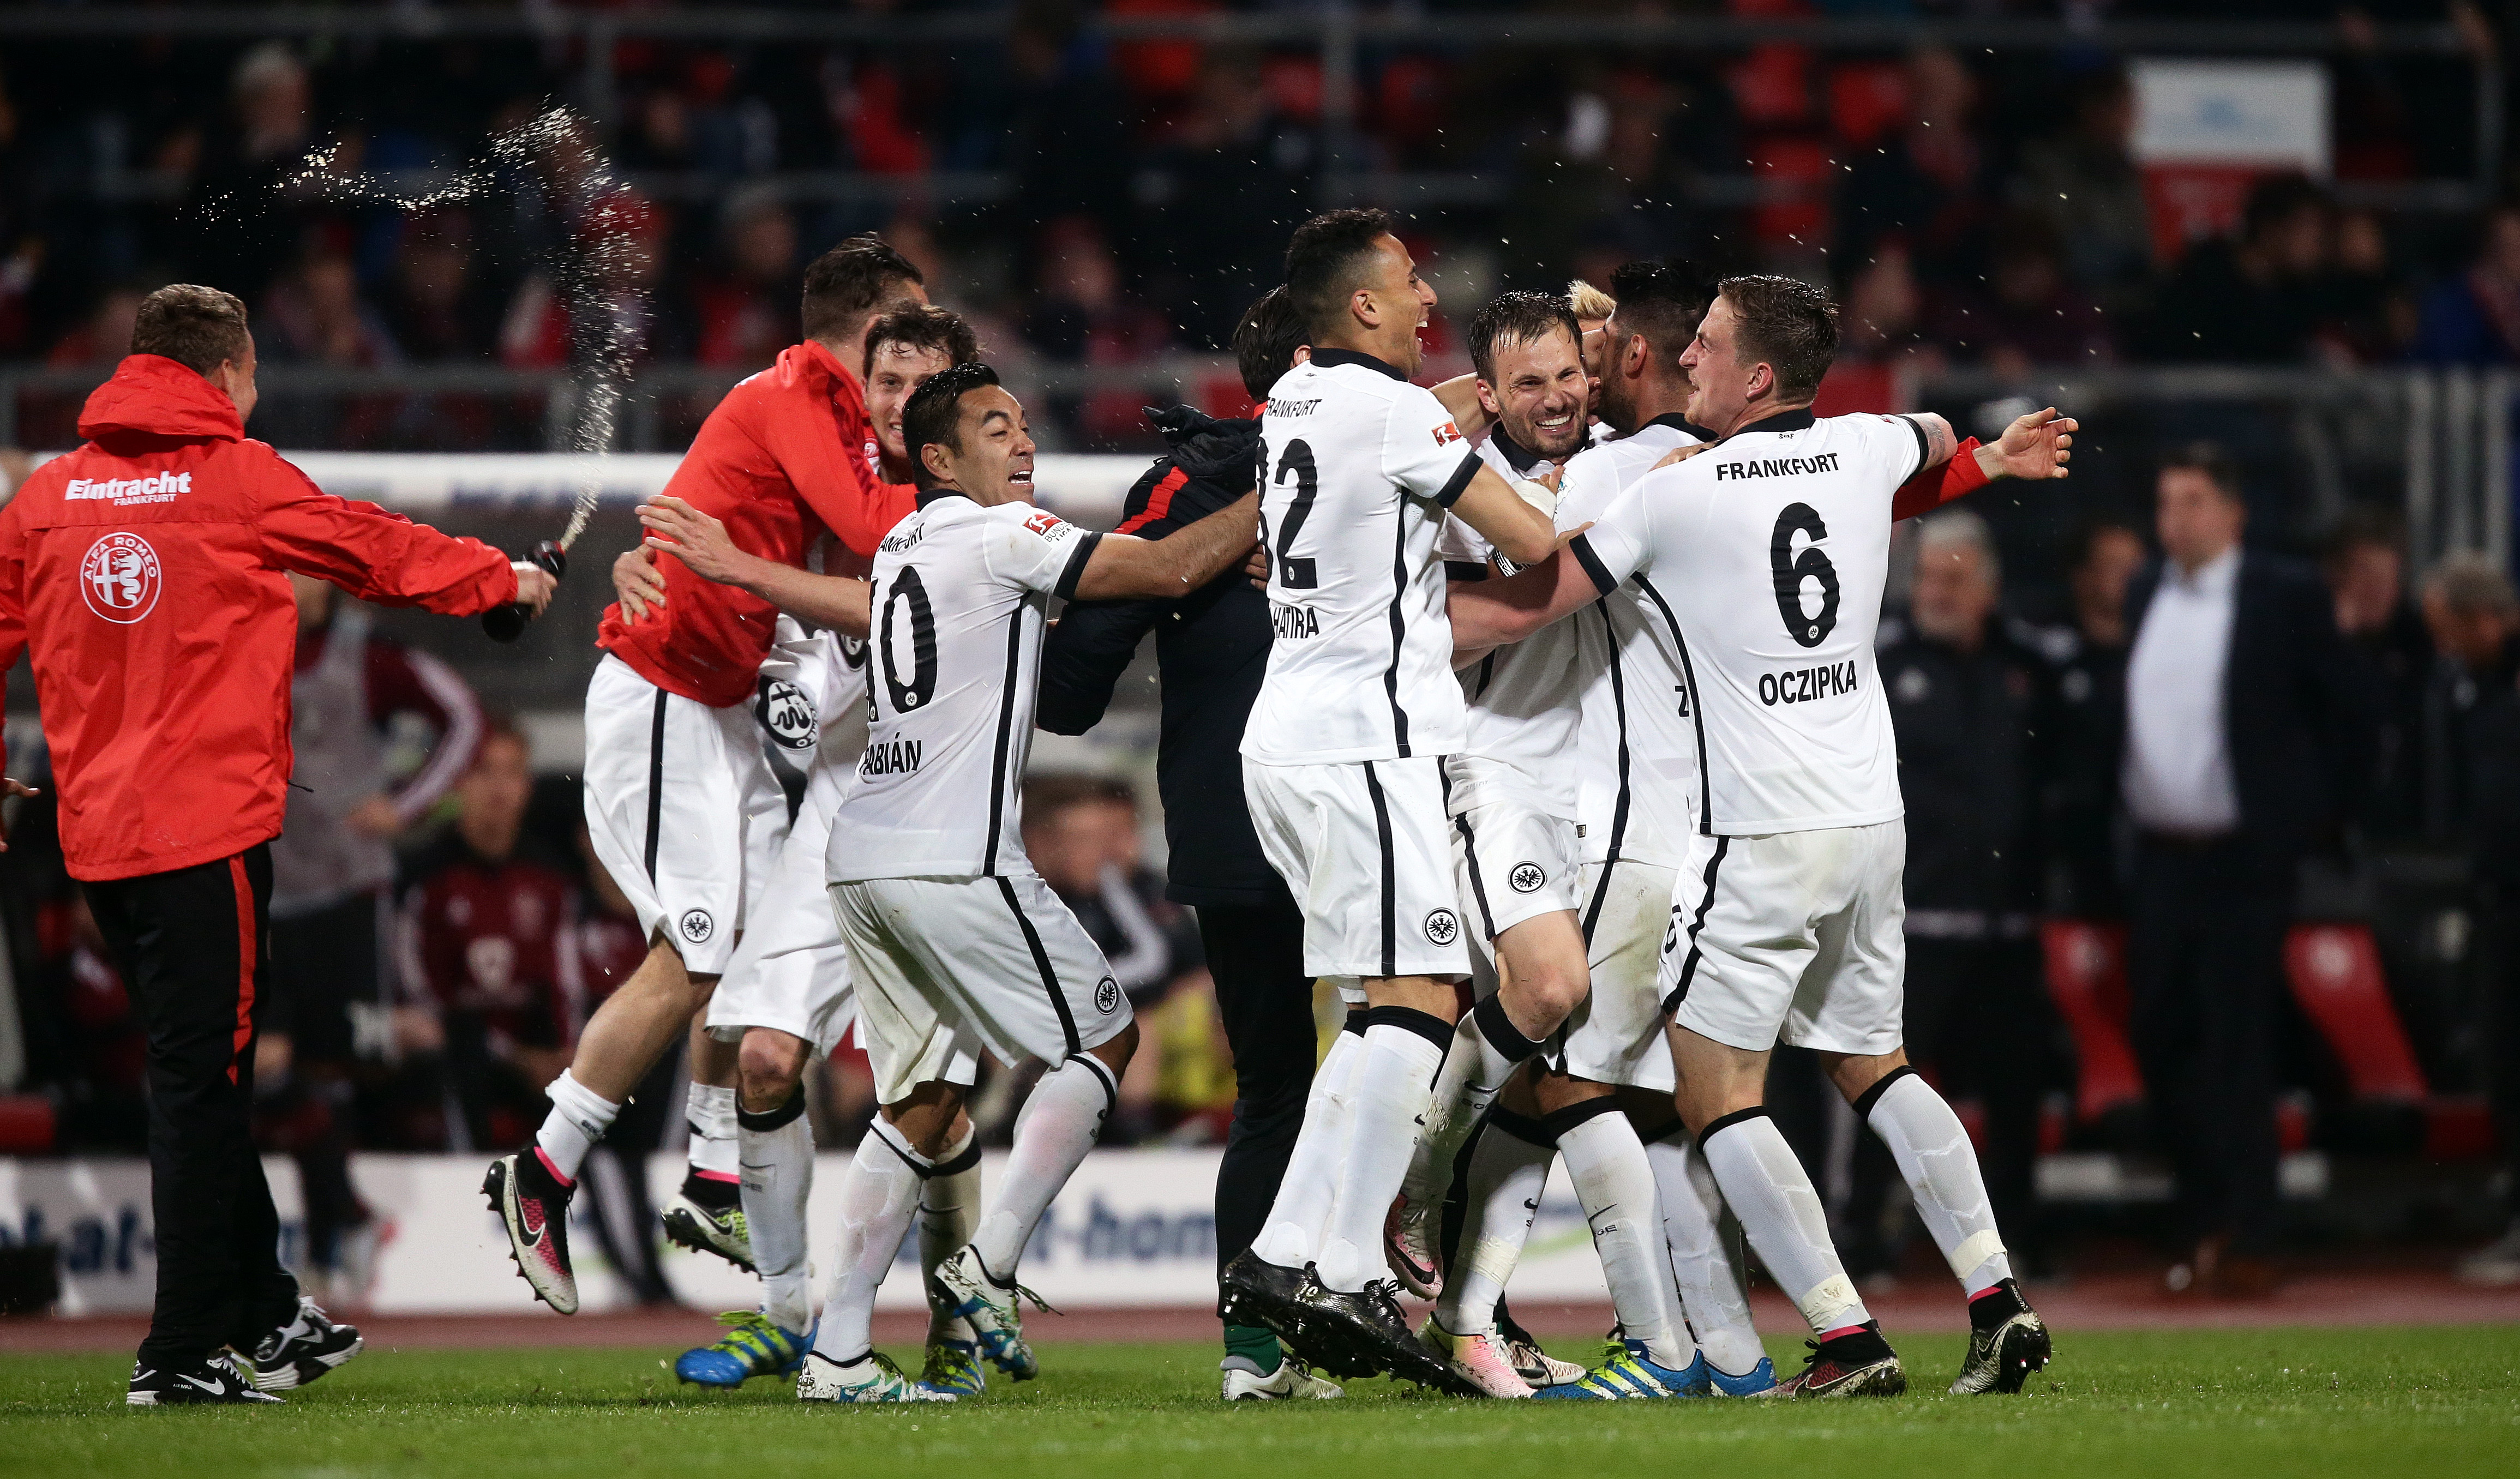 23052016 Fussball Bl Relegation 1 Fc Nürnberg Eintracht